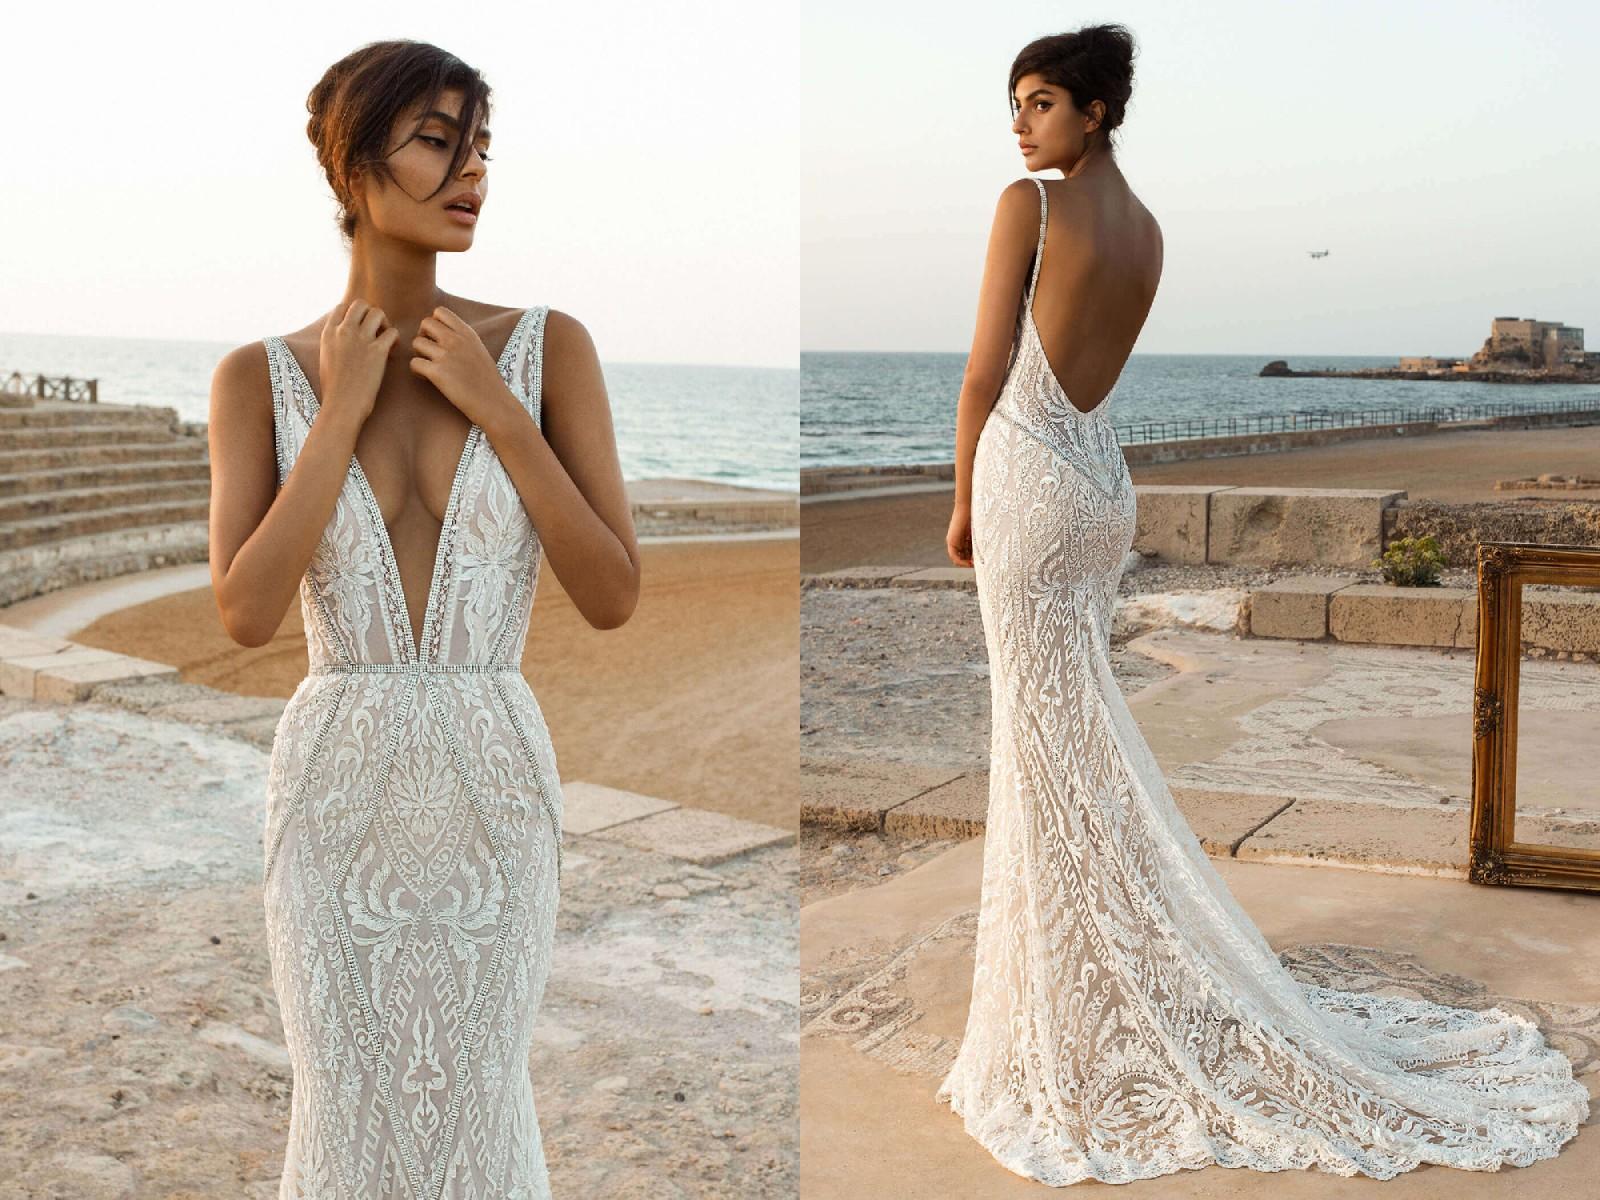 Galia lahav gala 802 preowned wedding dress on sale 43 off for Low back wedding dresses for sale